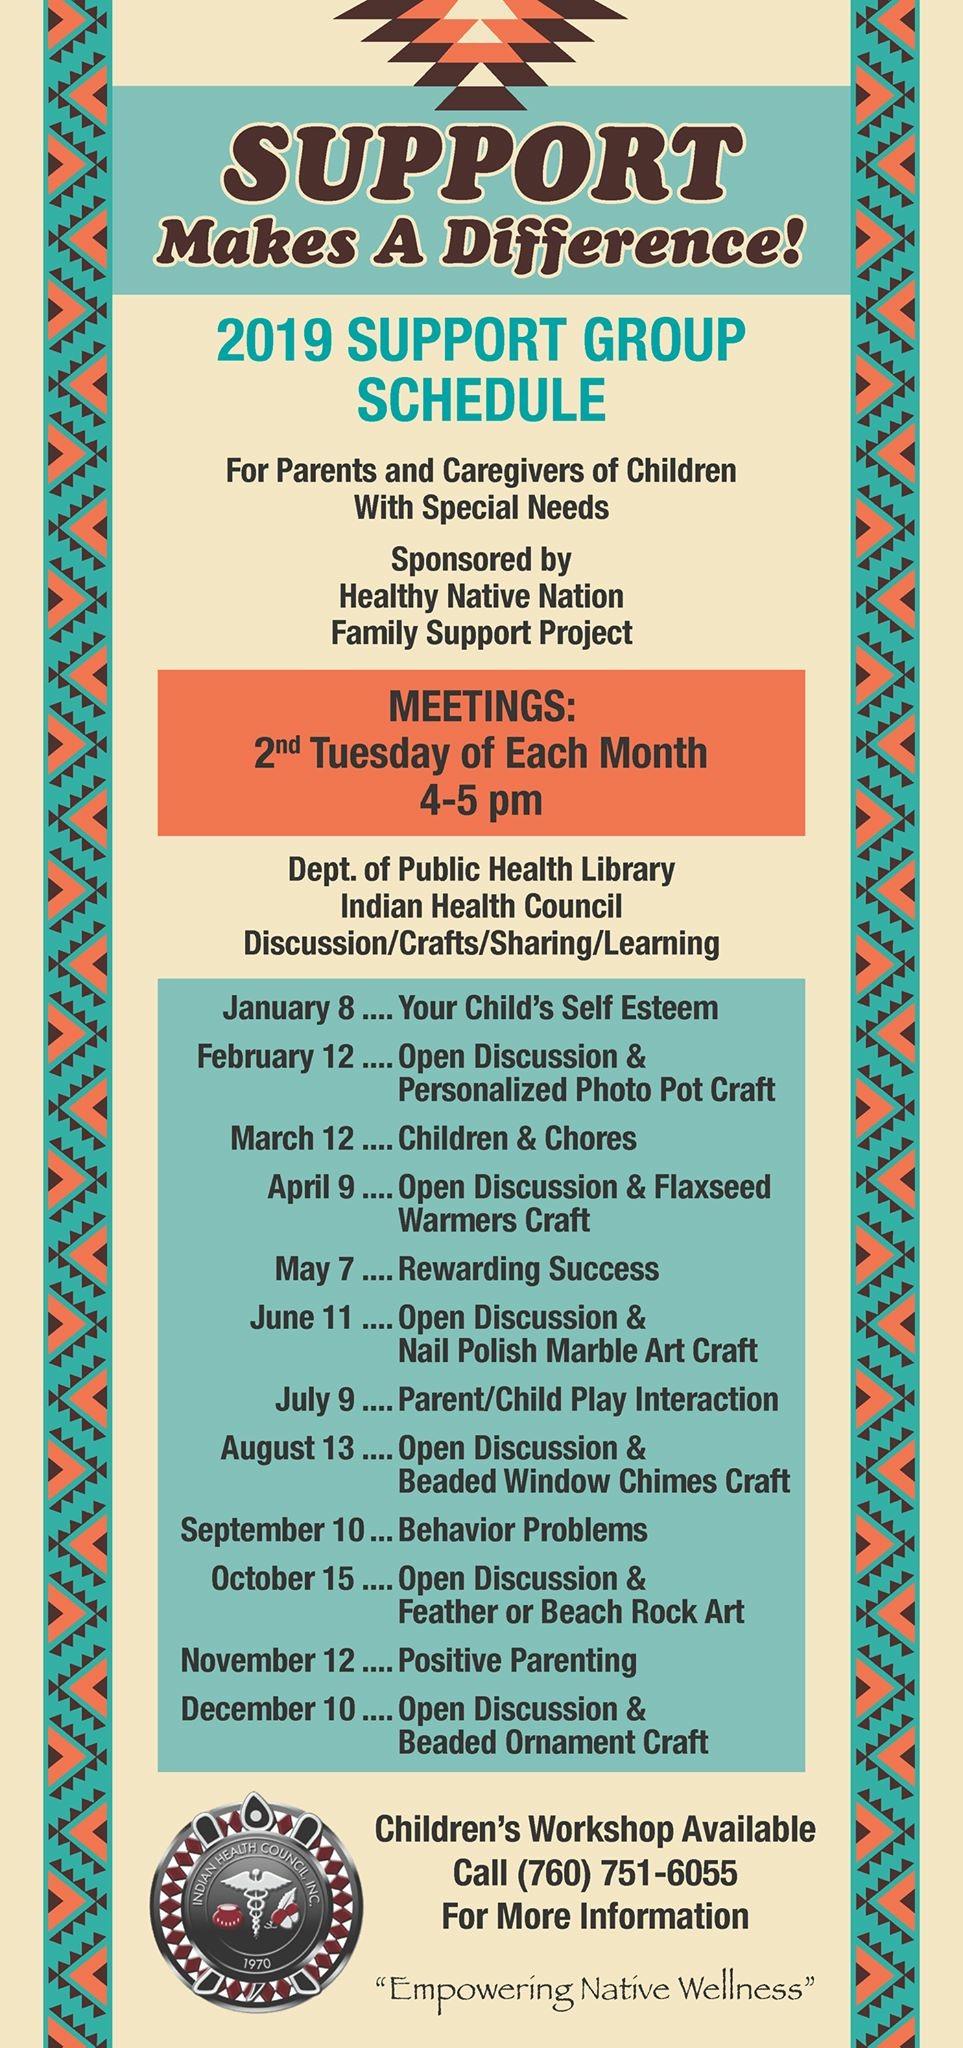 SCTCA – Southern California Tribal Chairmen's Association